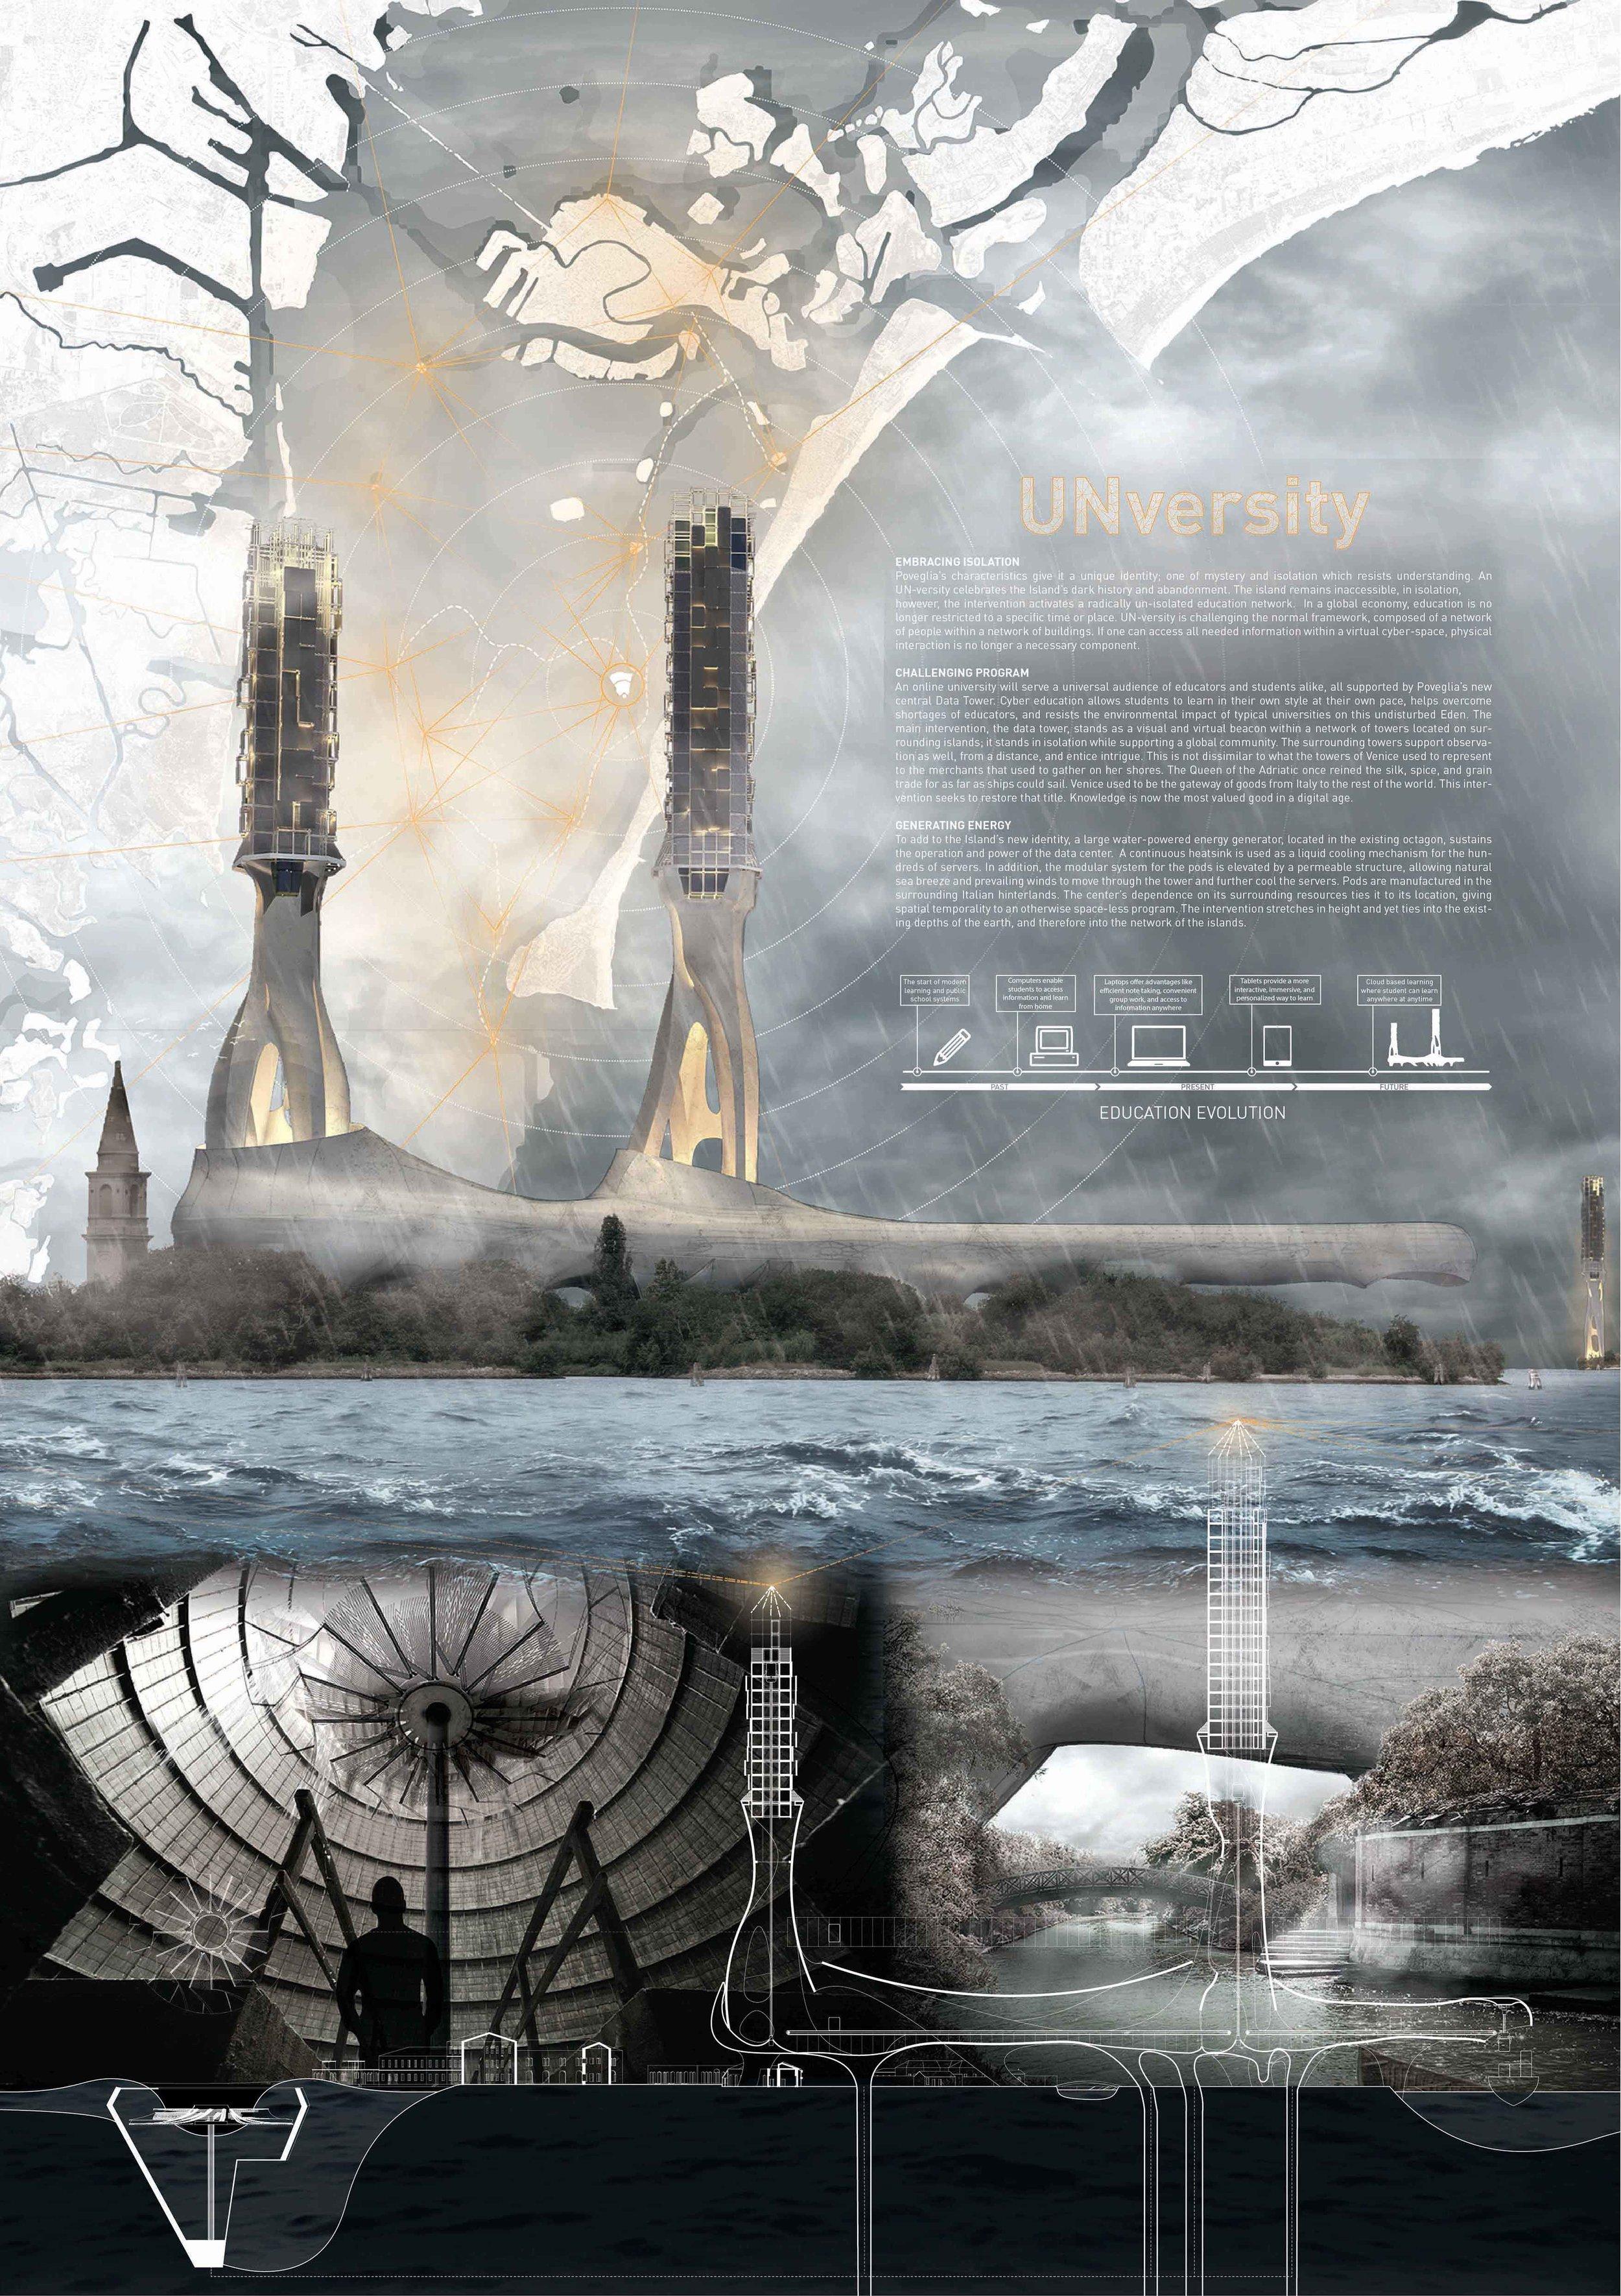 Univeristy Island UNversity Matt Fajkus Architecture MF MFx16 Board.jpg